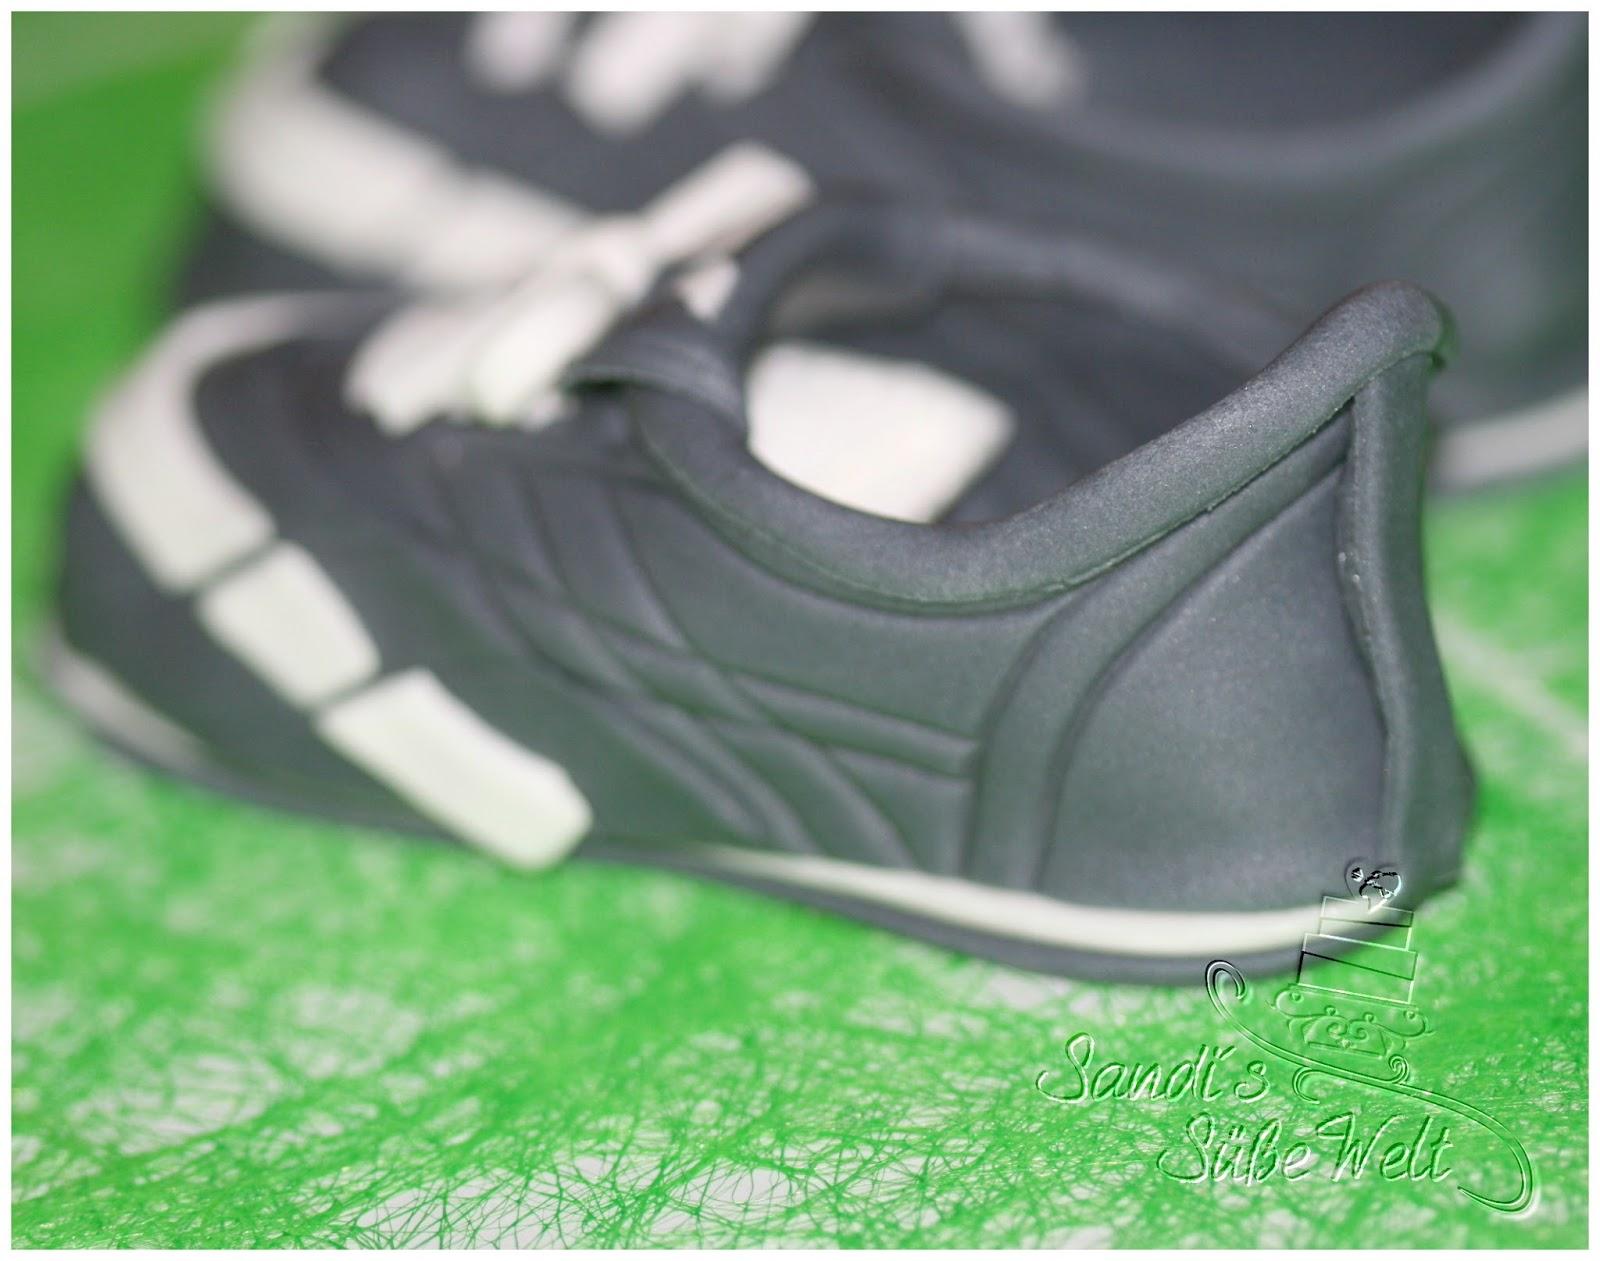 torte in form eines sneakers